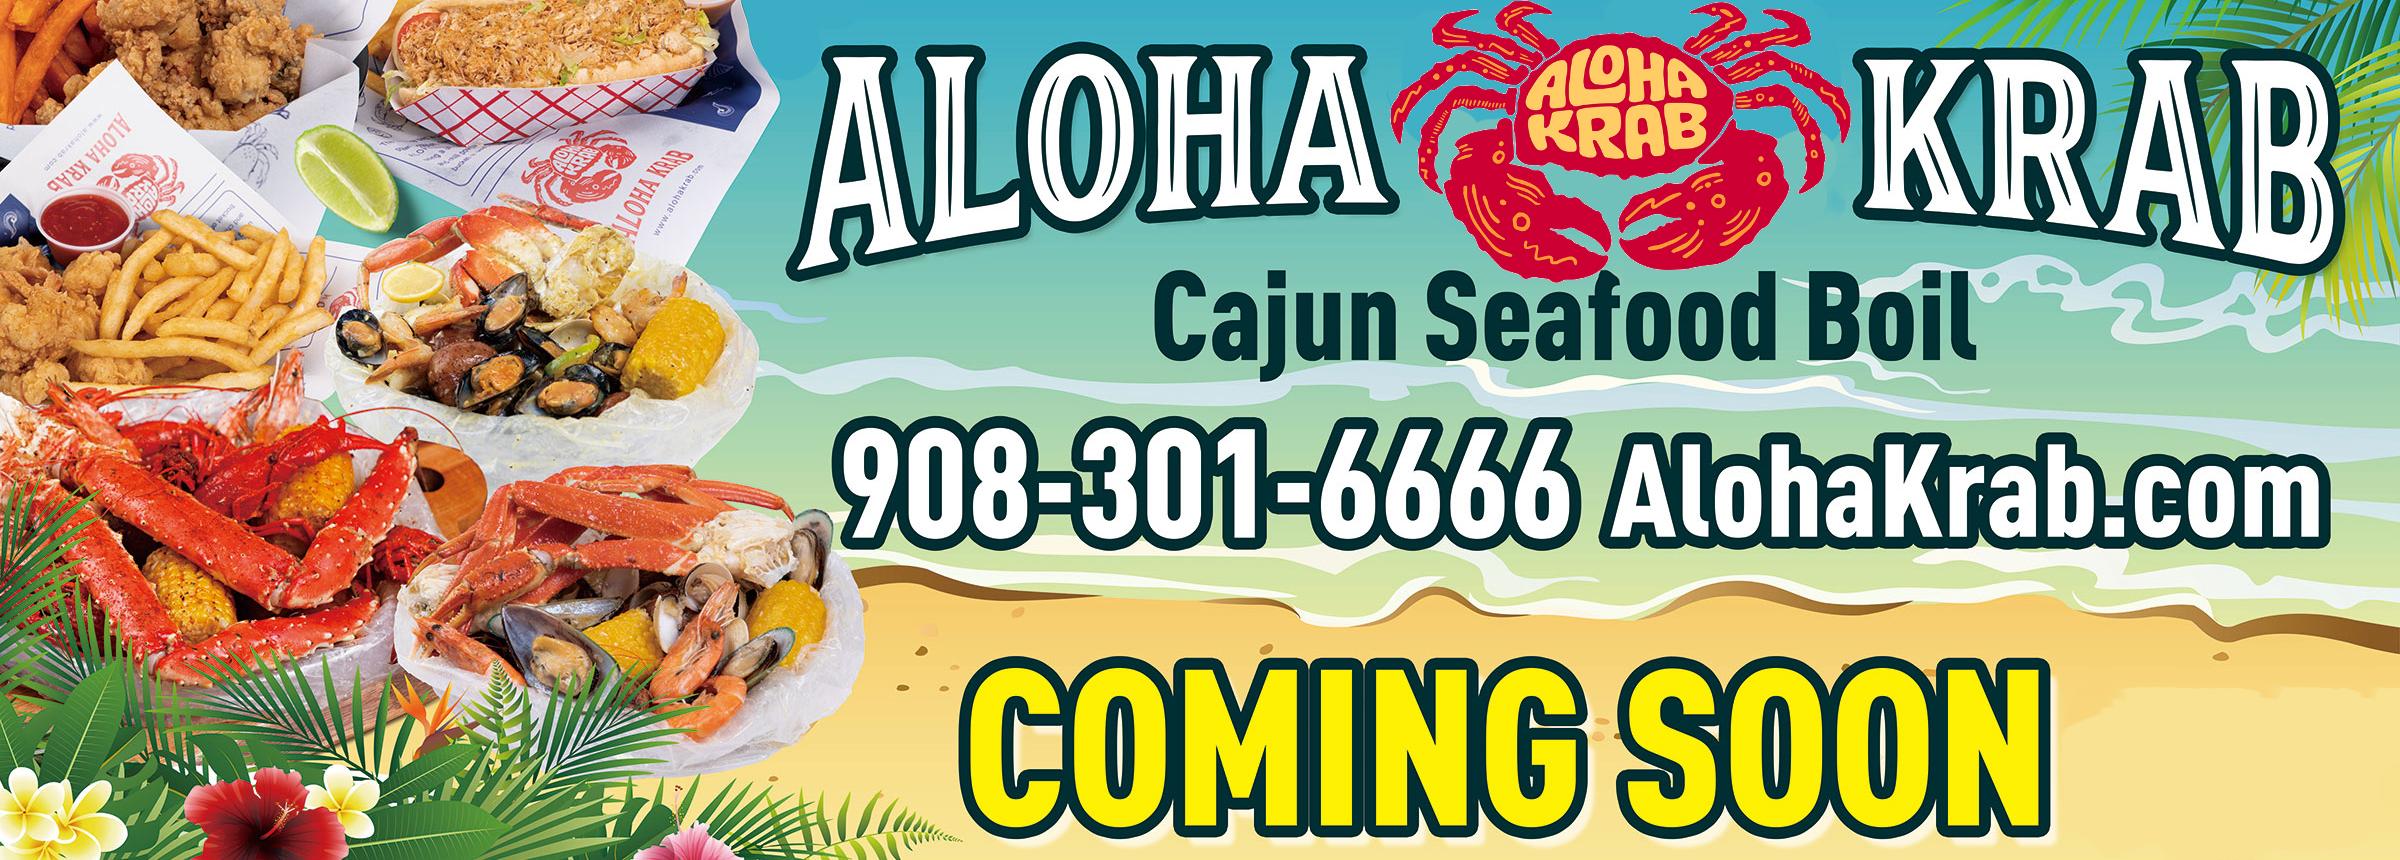 Aloha Krab Hero Image Coming Soon